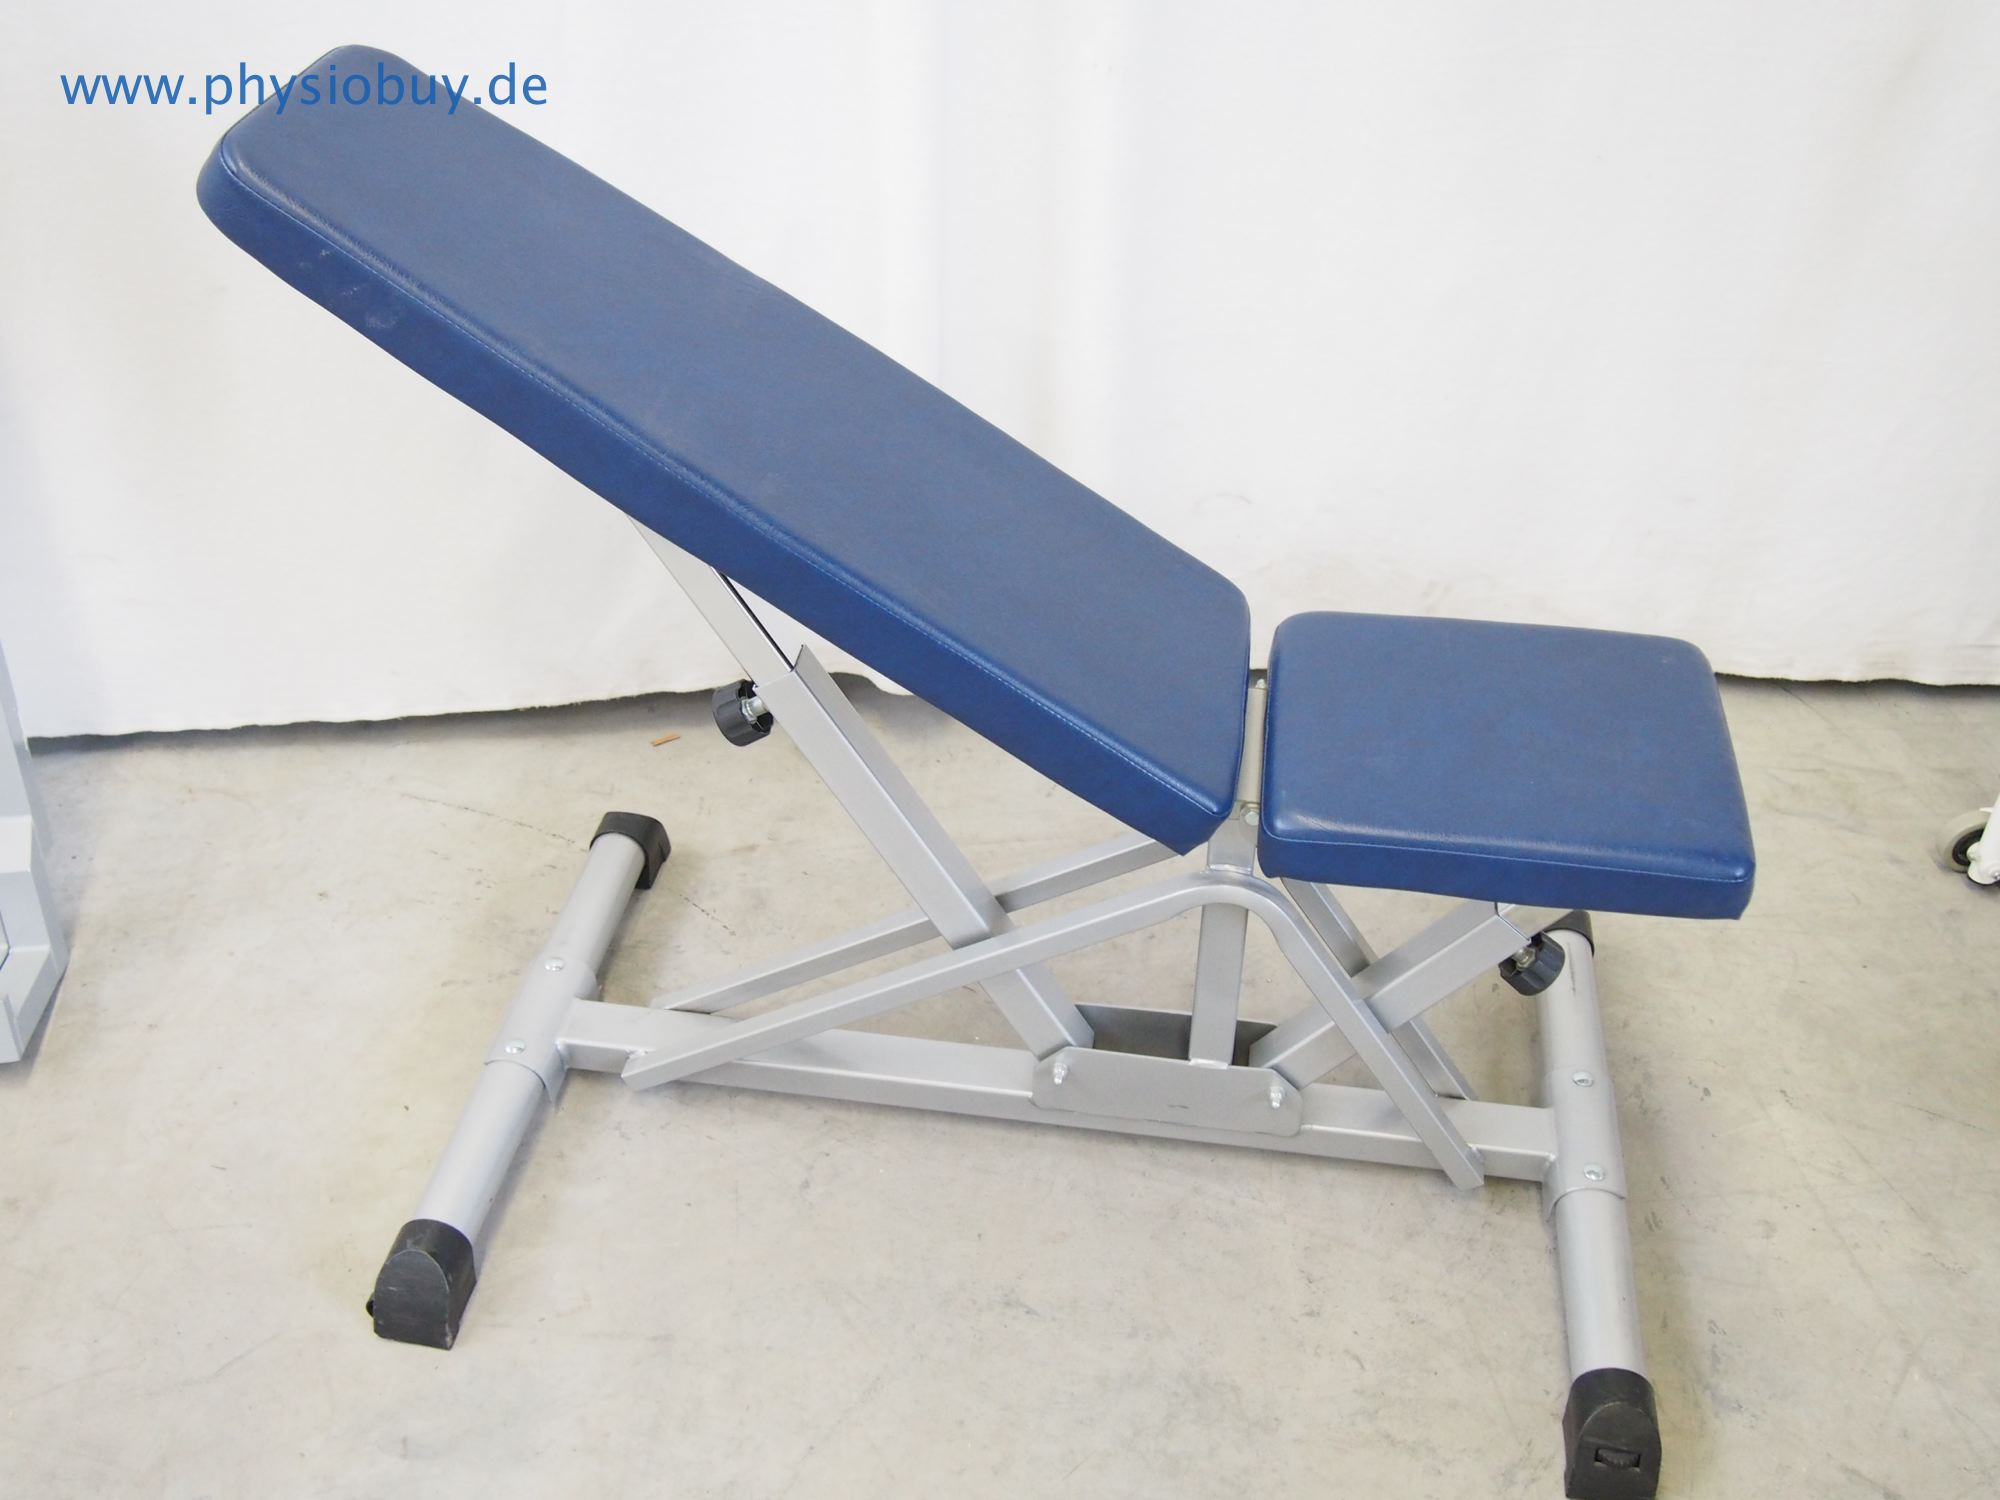 gebrauchtger te kraftger te kraft cardioger te therapieliegen behandlungsliegen und. Black Bedroom Furniture Sets. Home Design Ideas